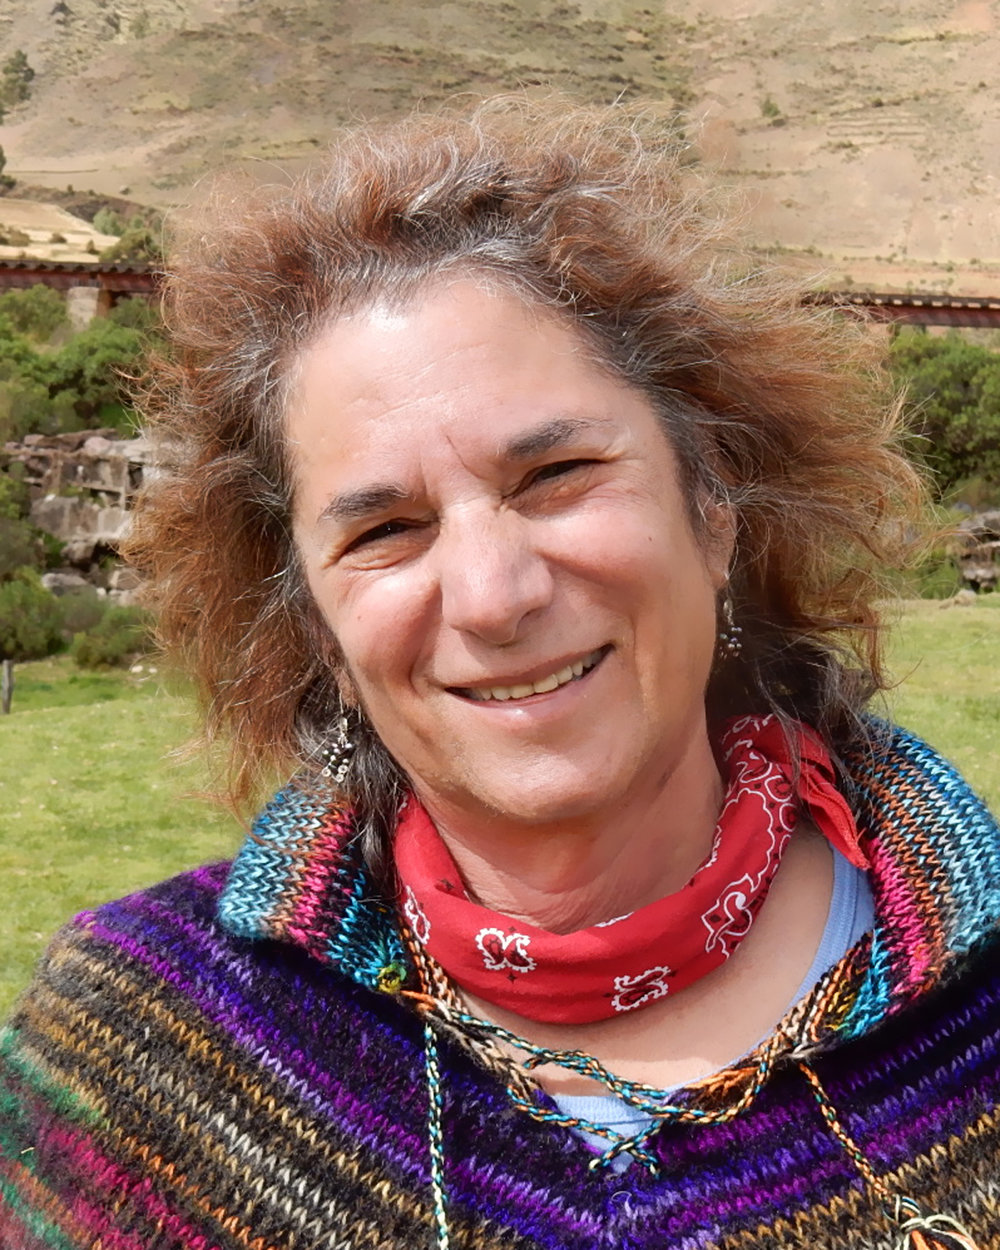 Suzannah Tebbe Davis - shamanic energy medicine woman, sacred activist